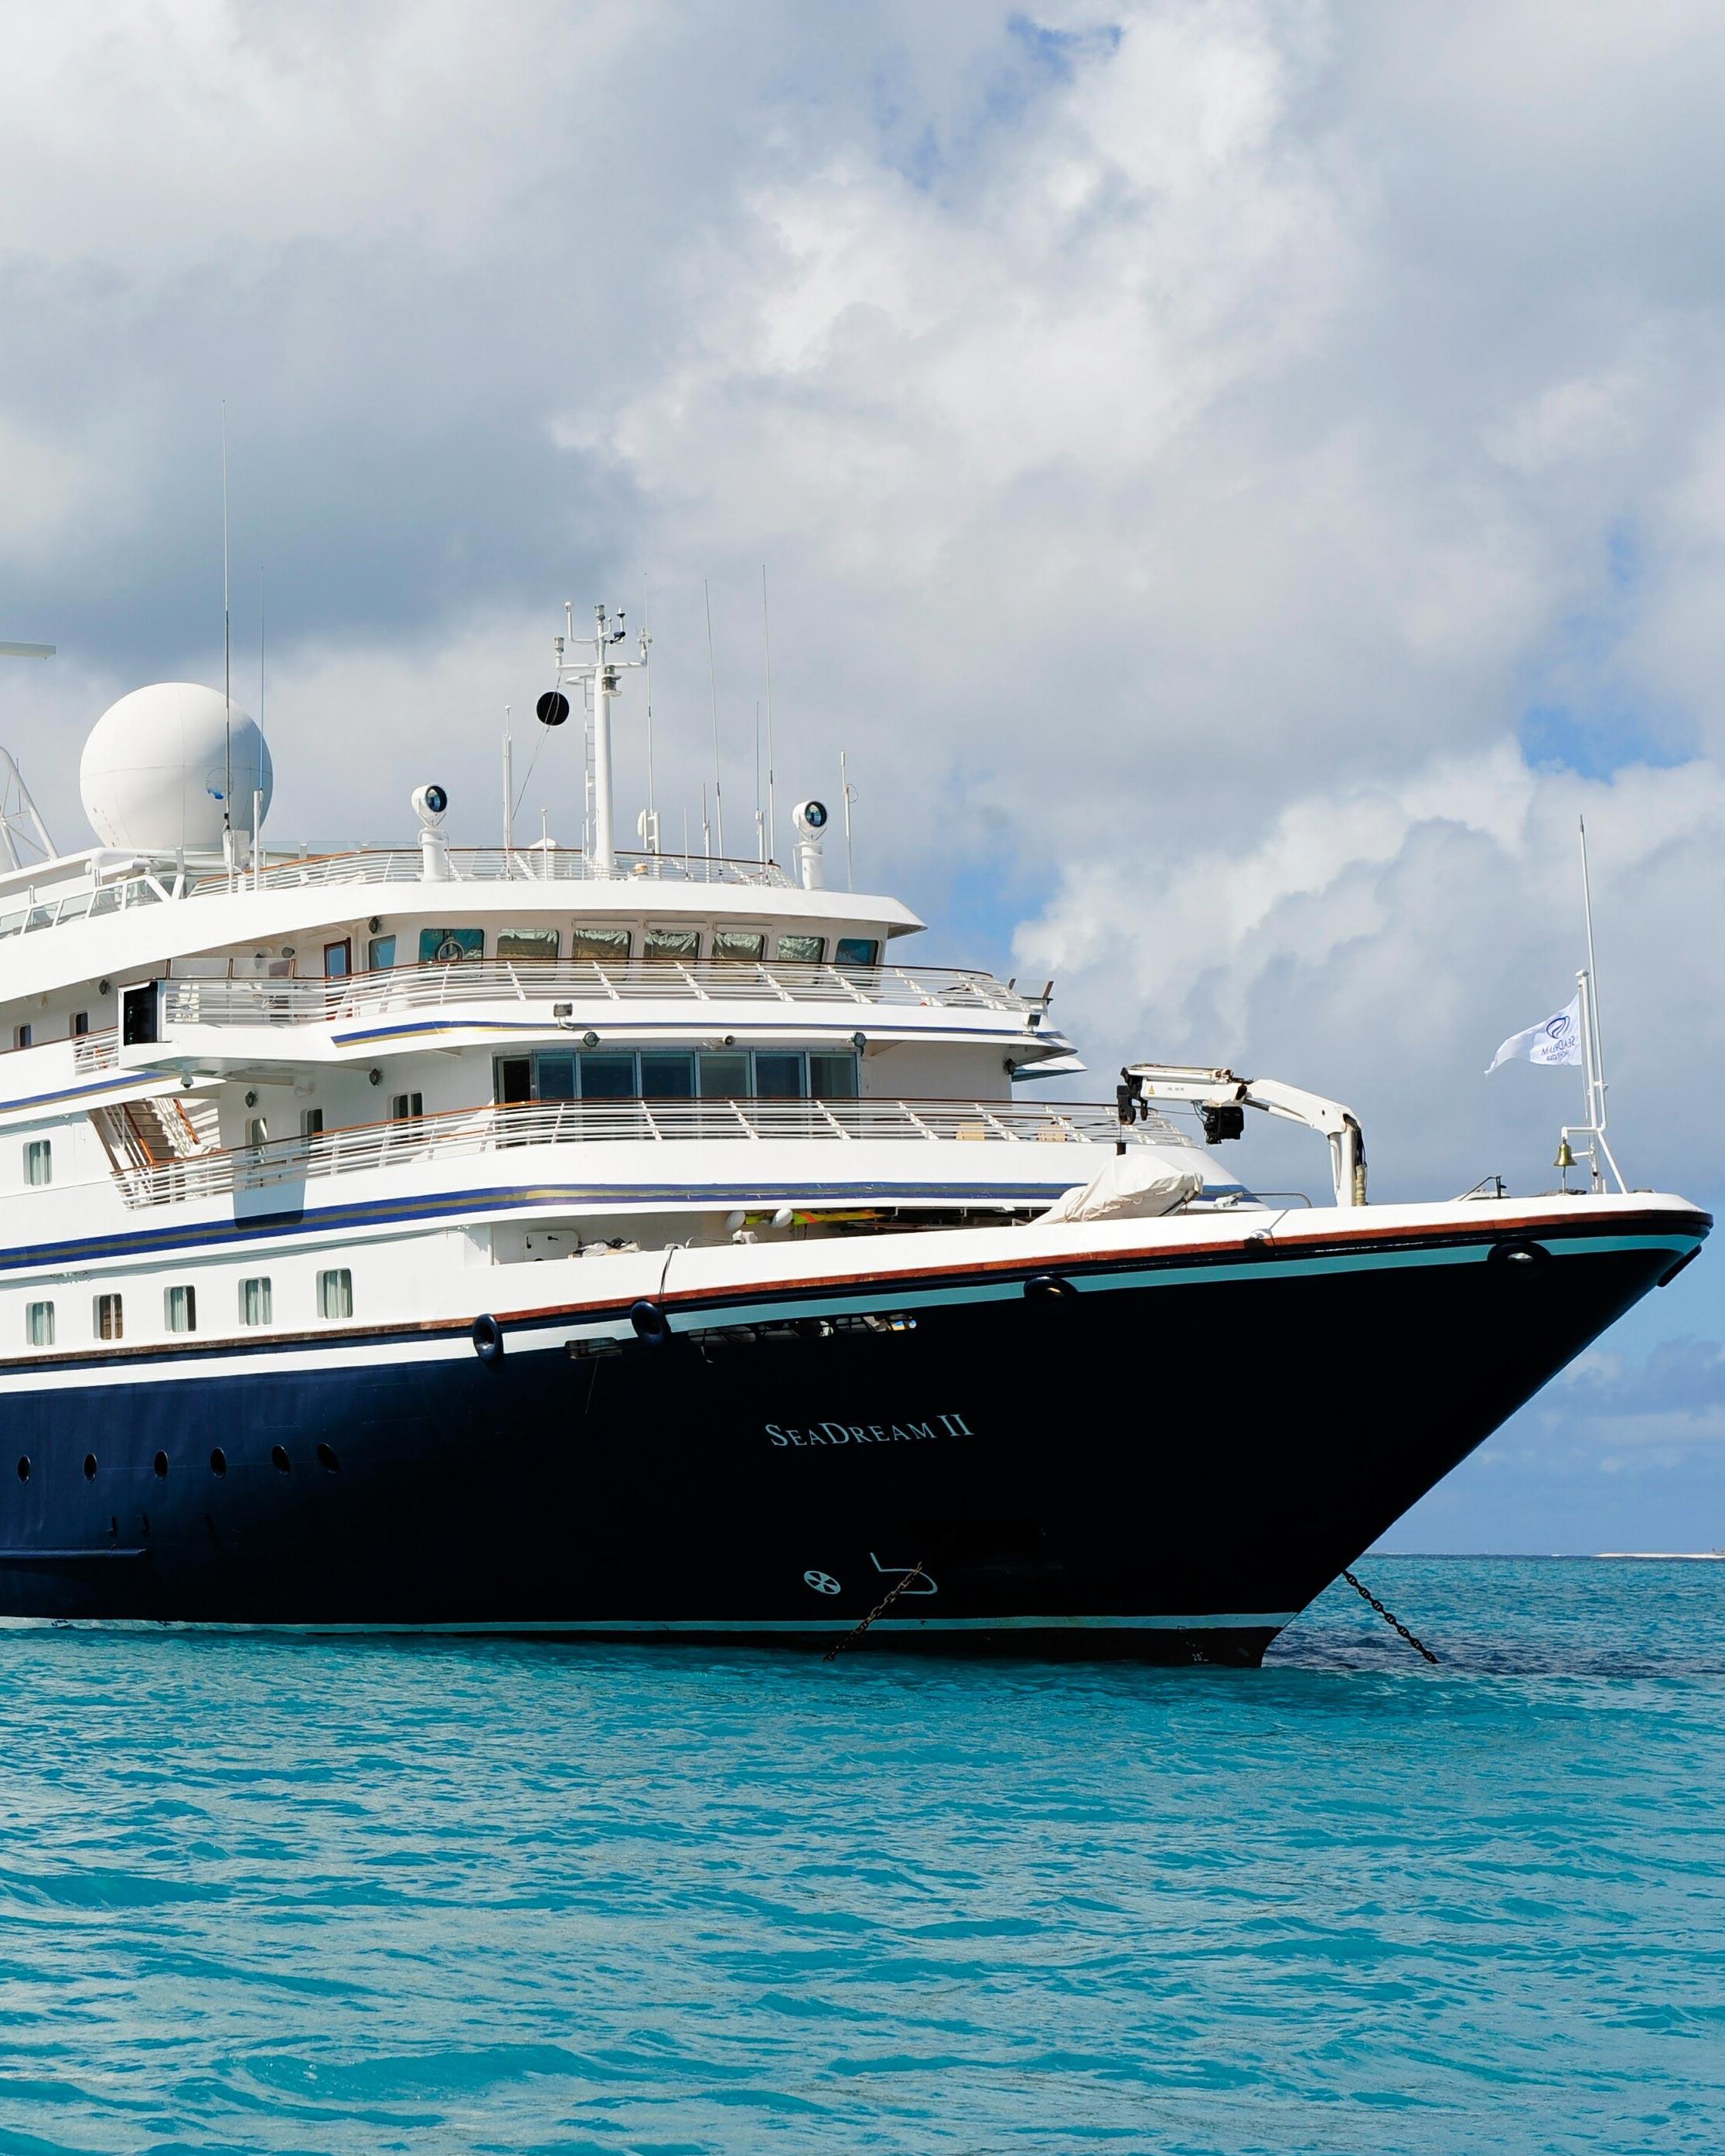 honeymoon-cruises-seadream-ii-0416.jpg